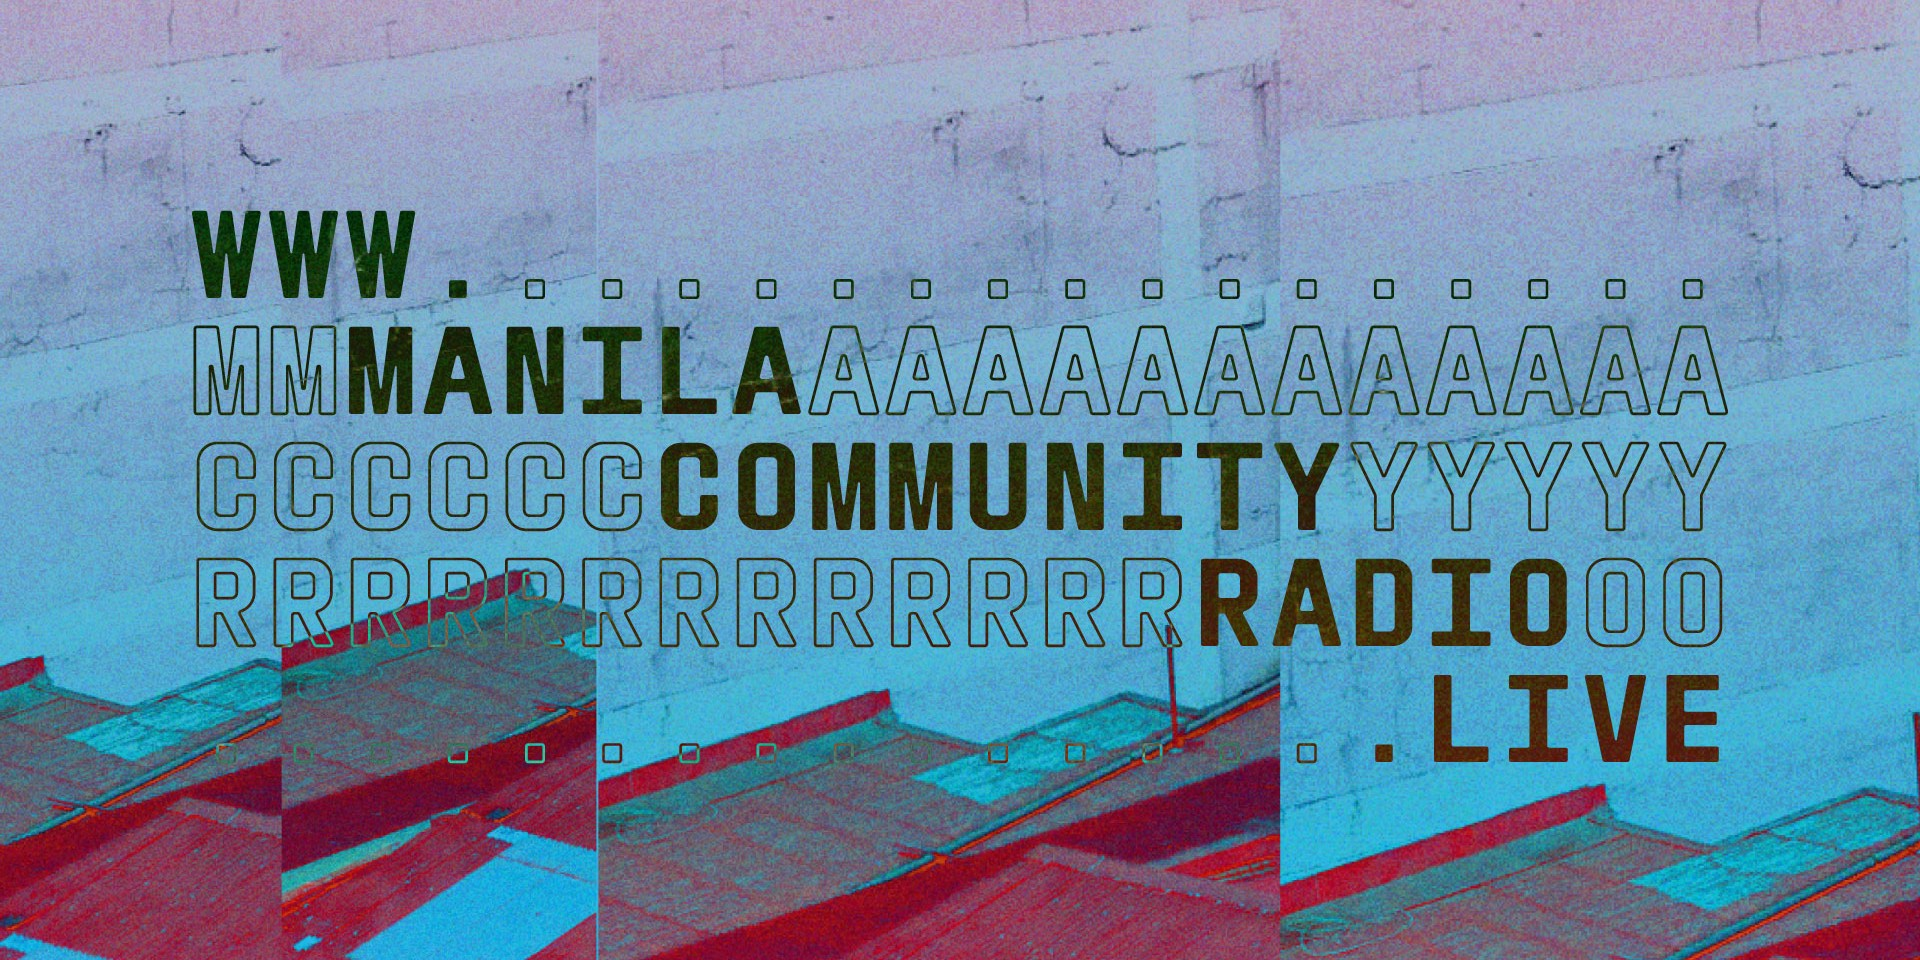 Manila Community Radio goes live with 15-hour stream